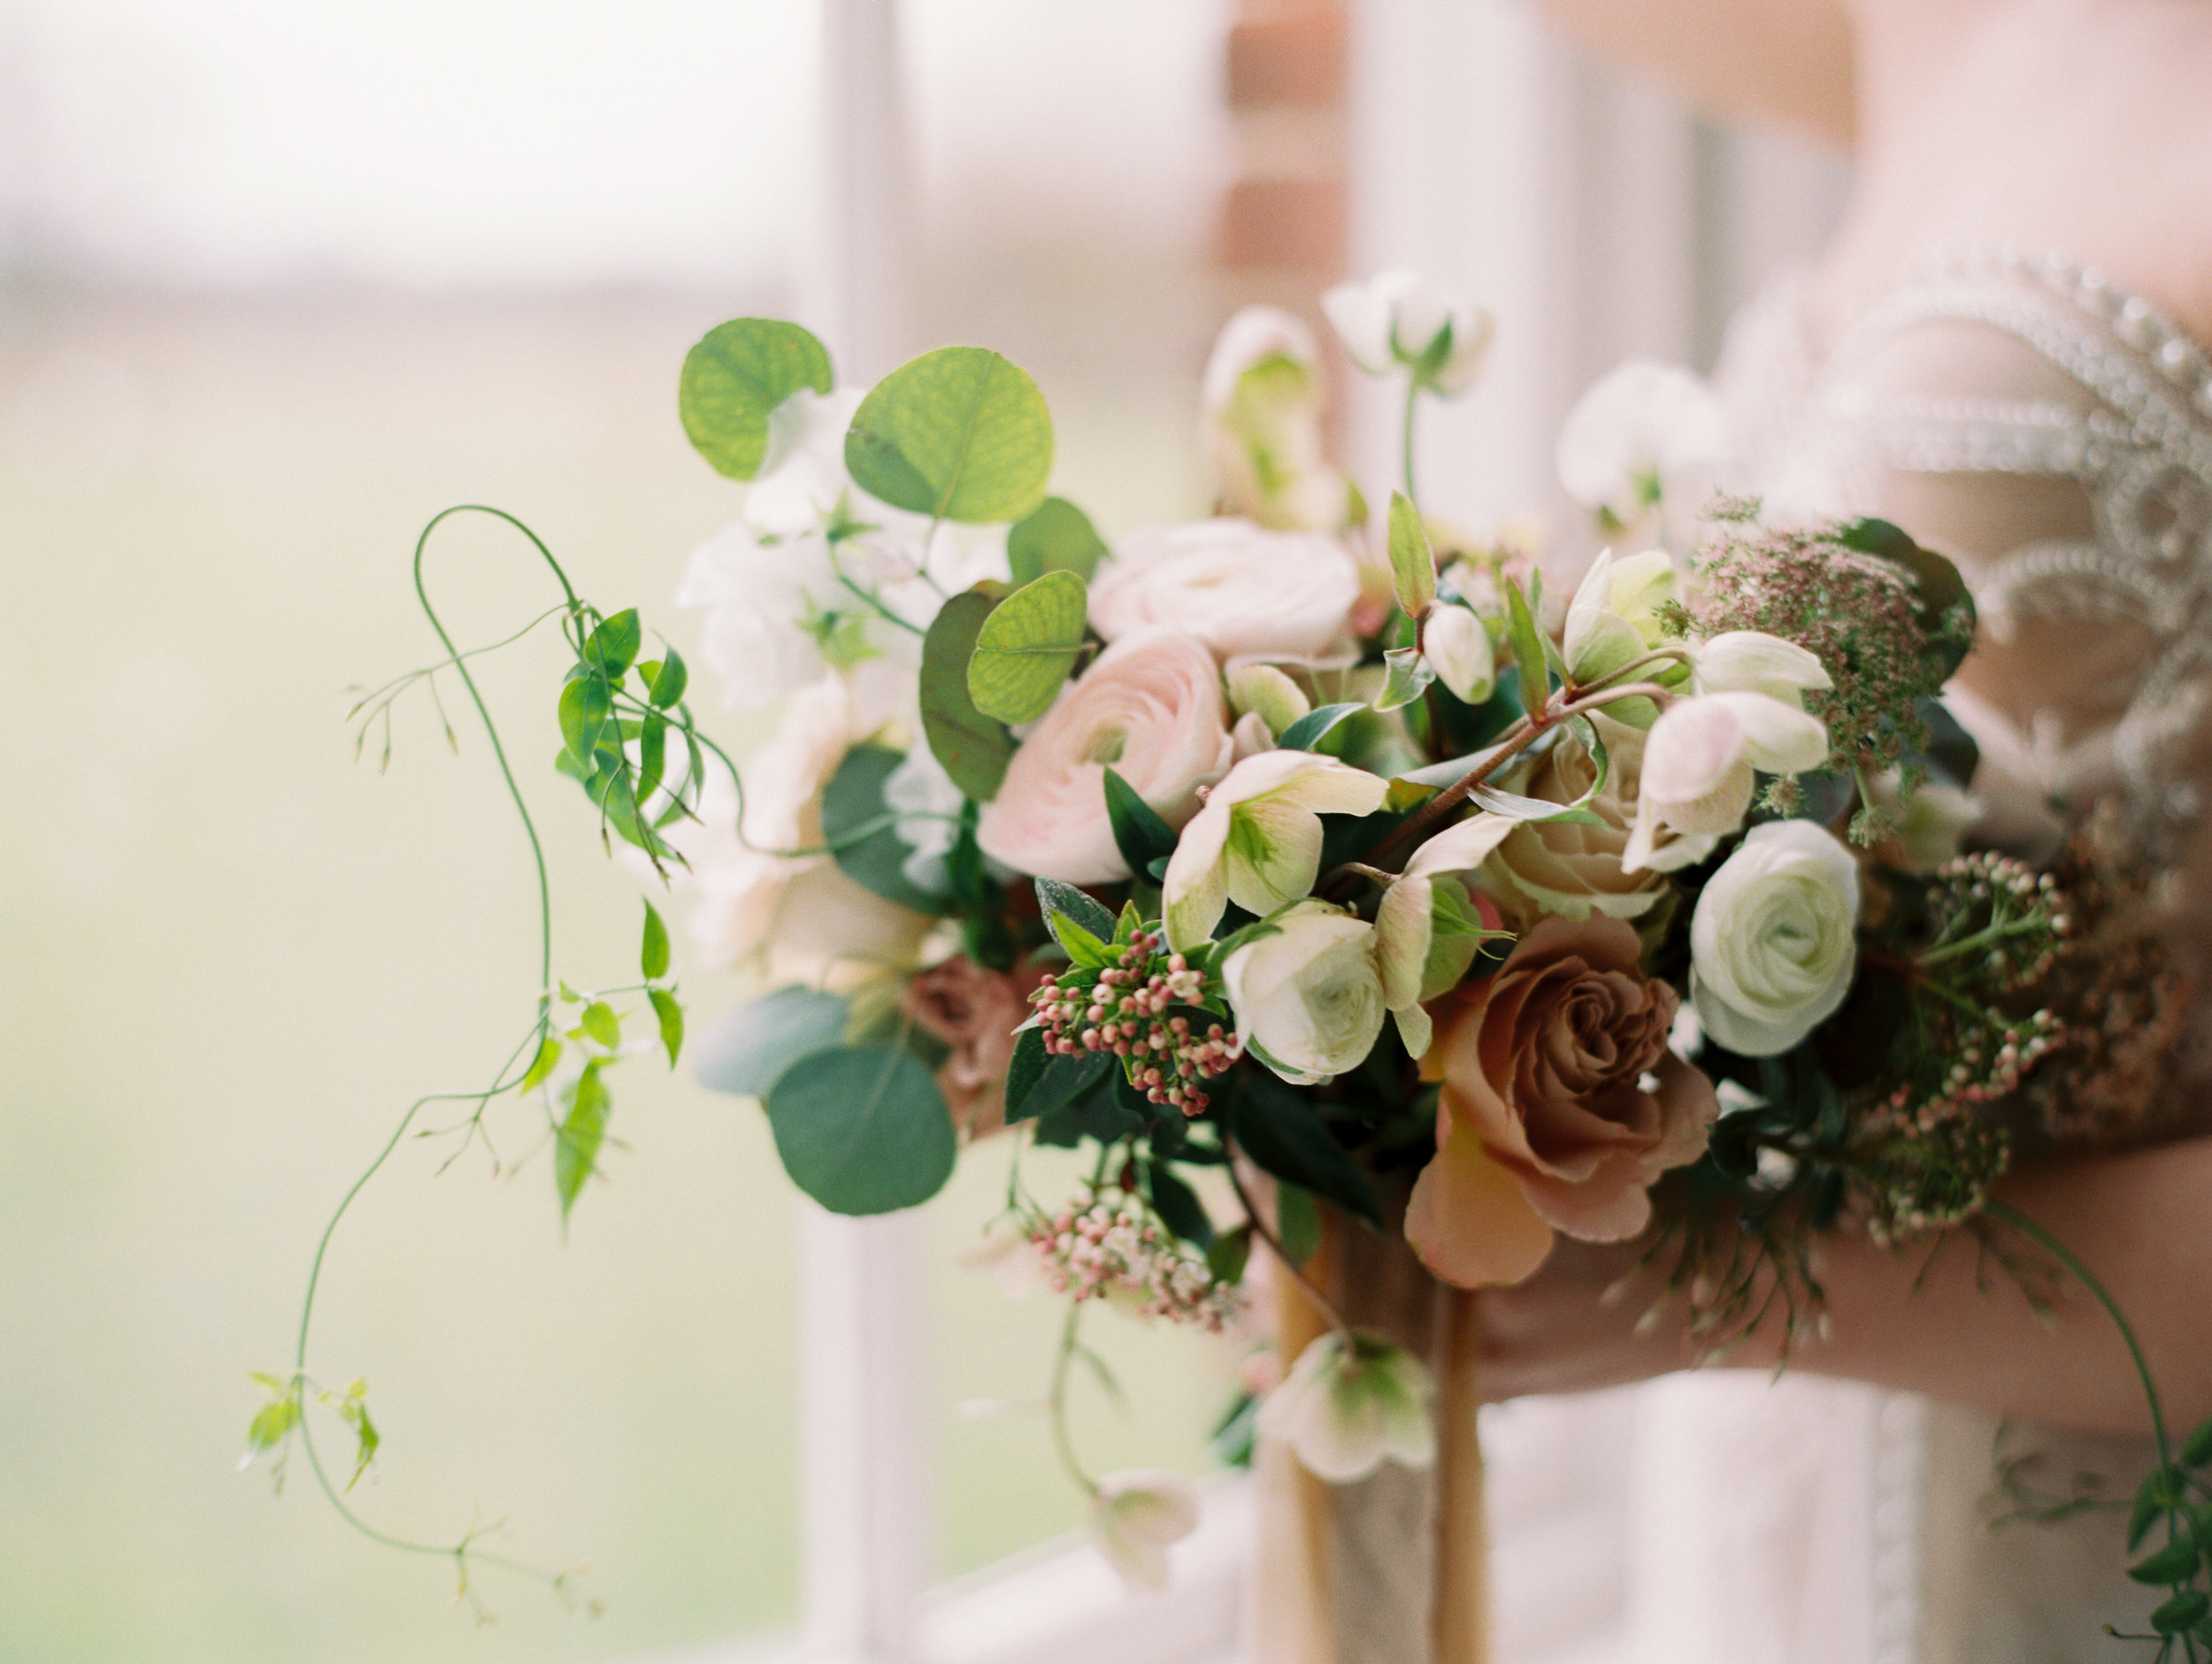 The Timeless Stylist-Elegant and Romantic Wedding Styling-Timeless Wedding Bouquet.jpg